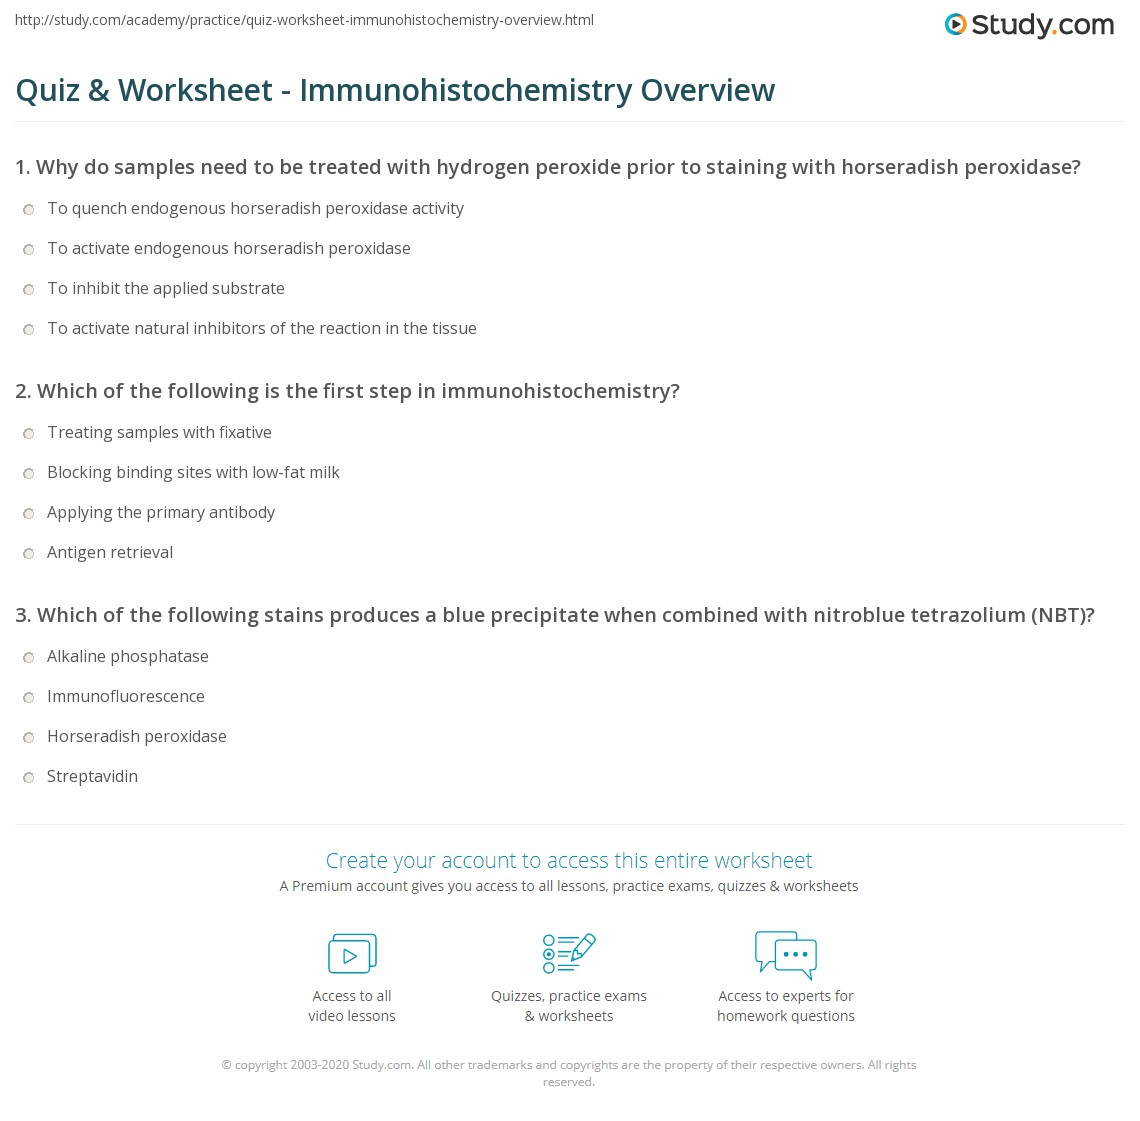 Quiz & Worksheet - Immunohistochemistry Overview   Study com